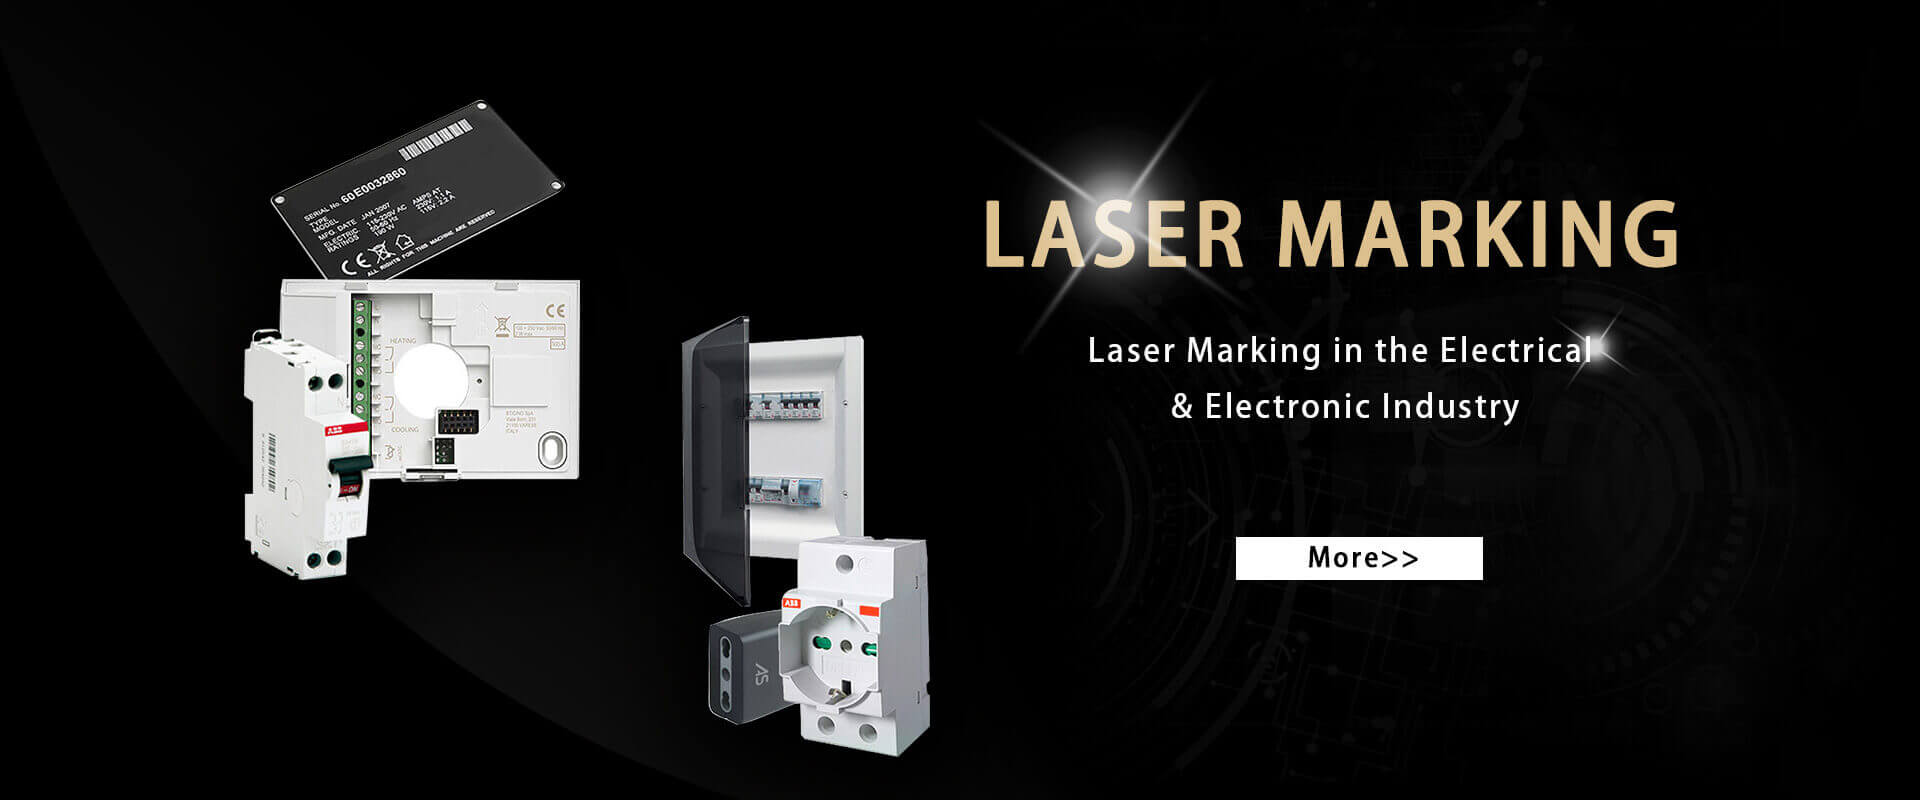 Laser Marking of Electronics